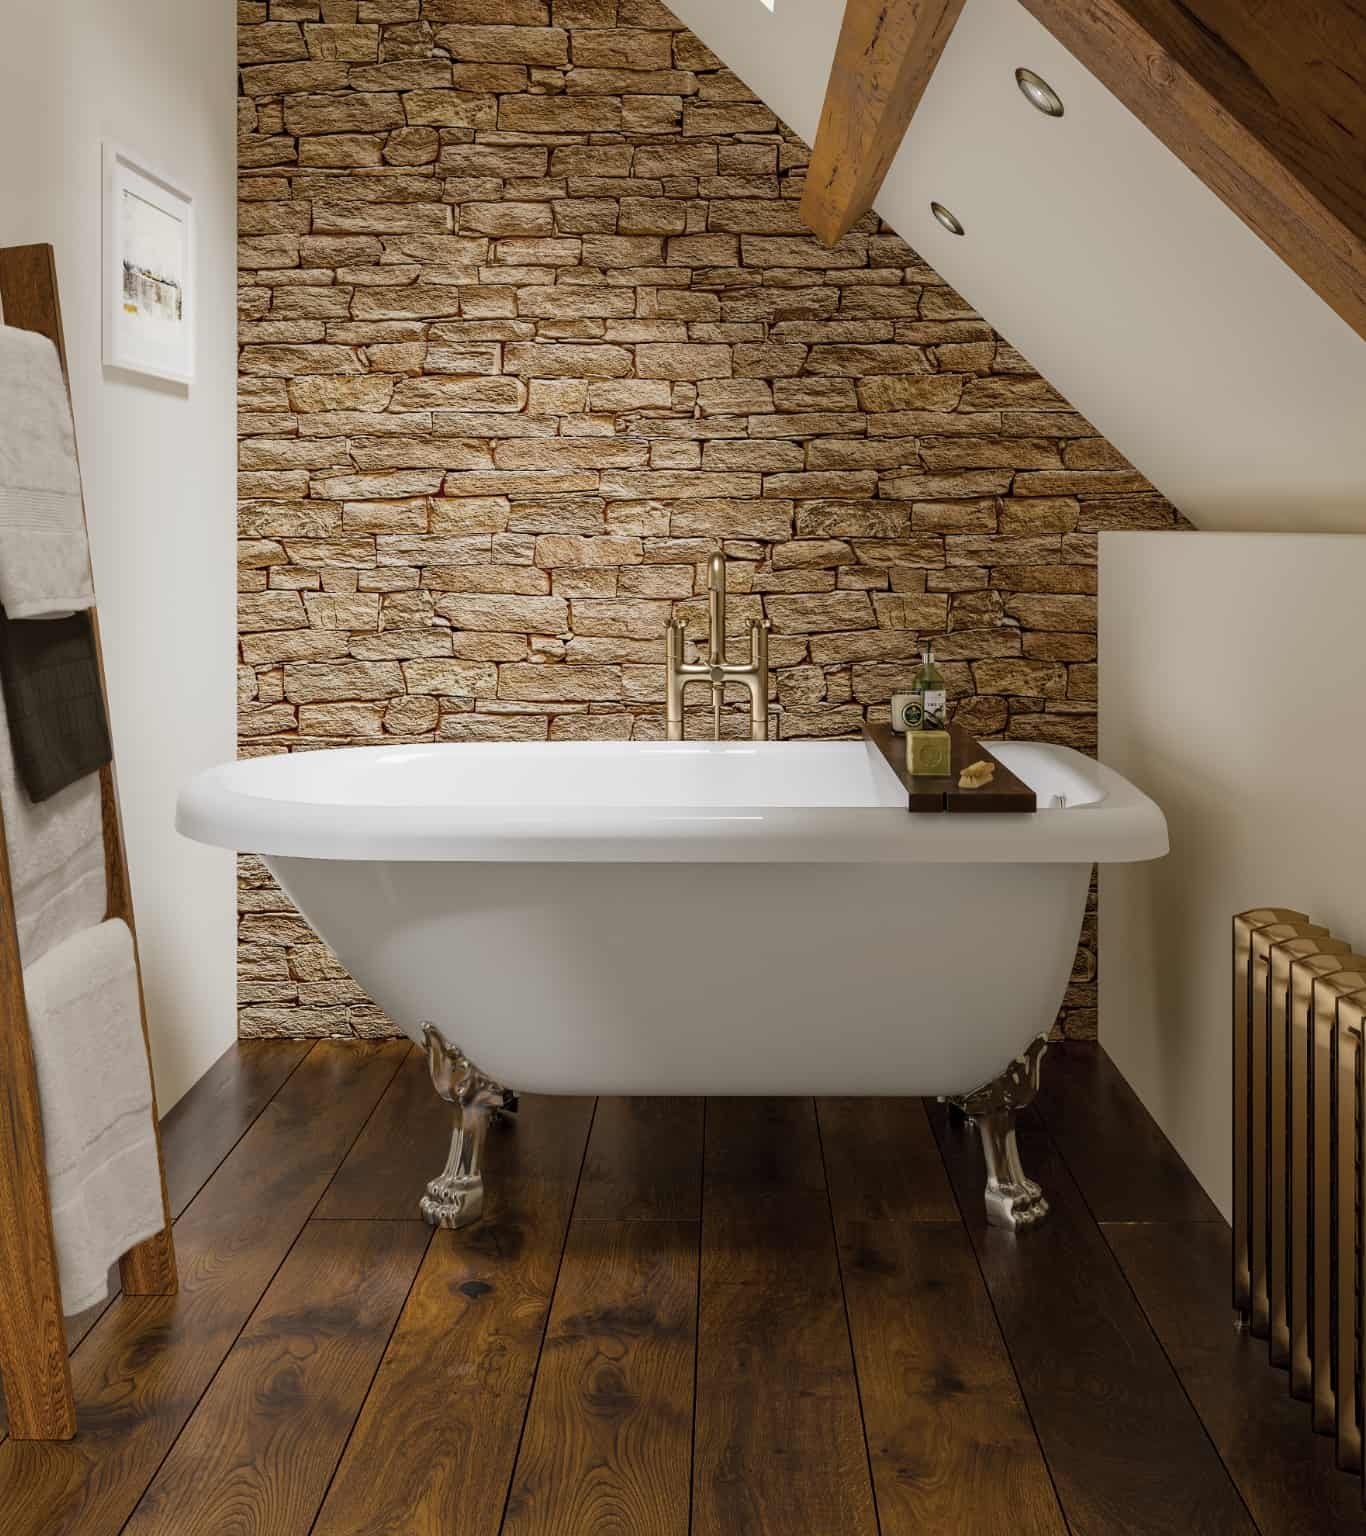 The Trojan Uppingham Bath